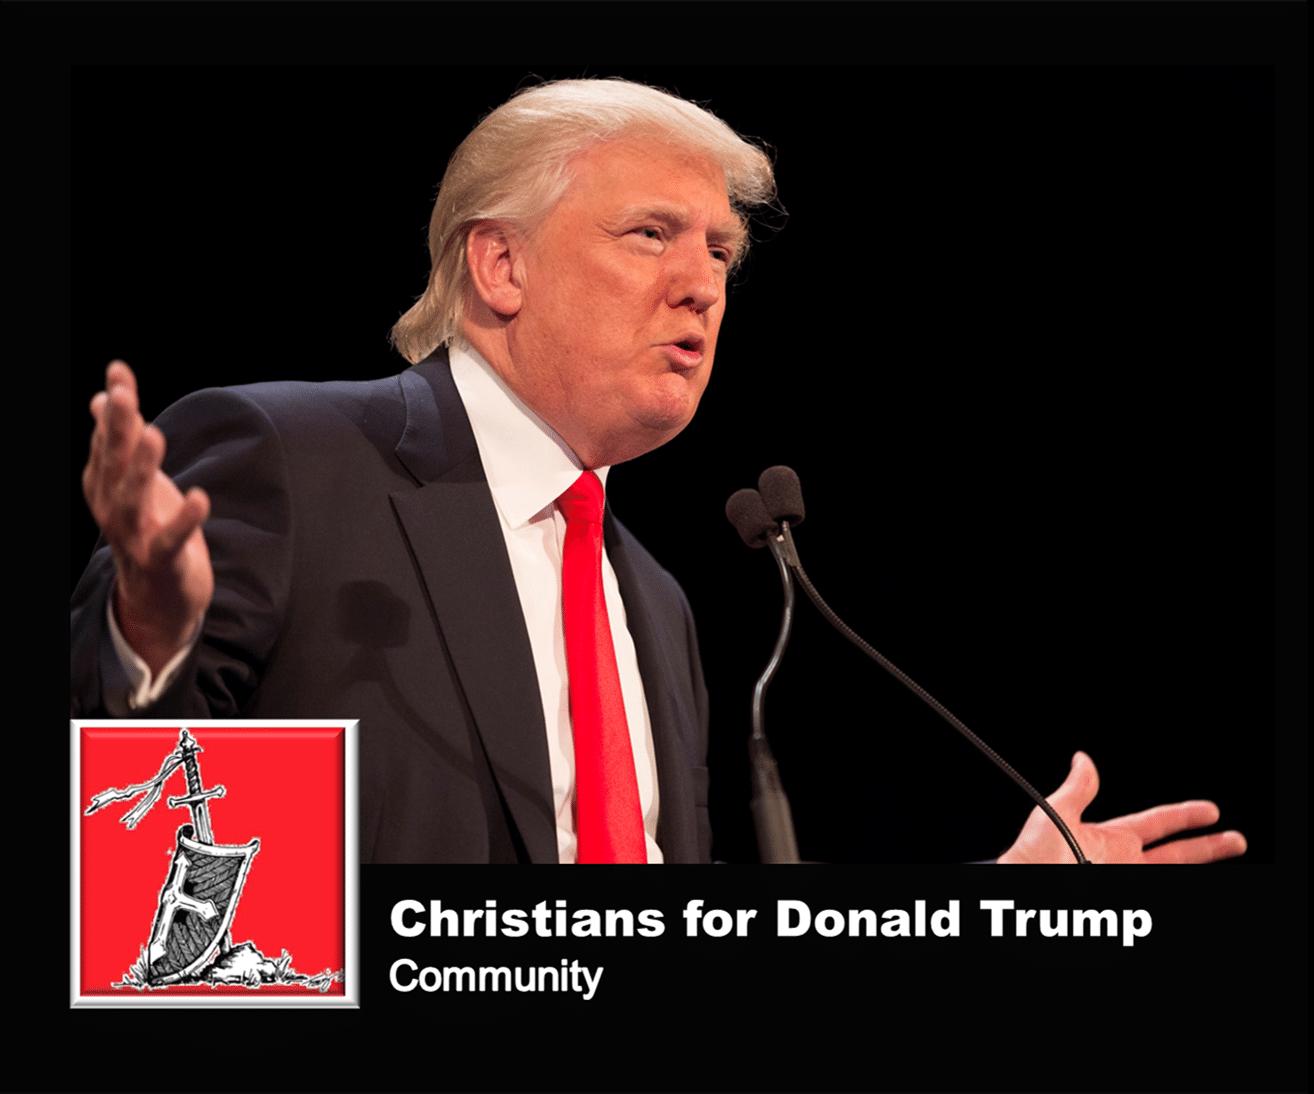 Christians for Donald Trump